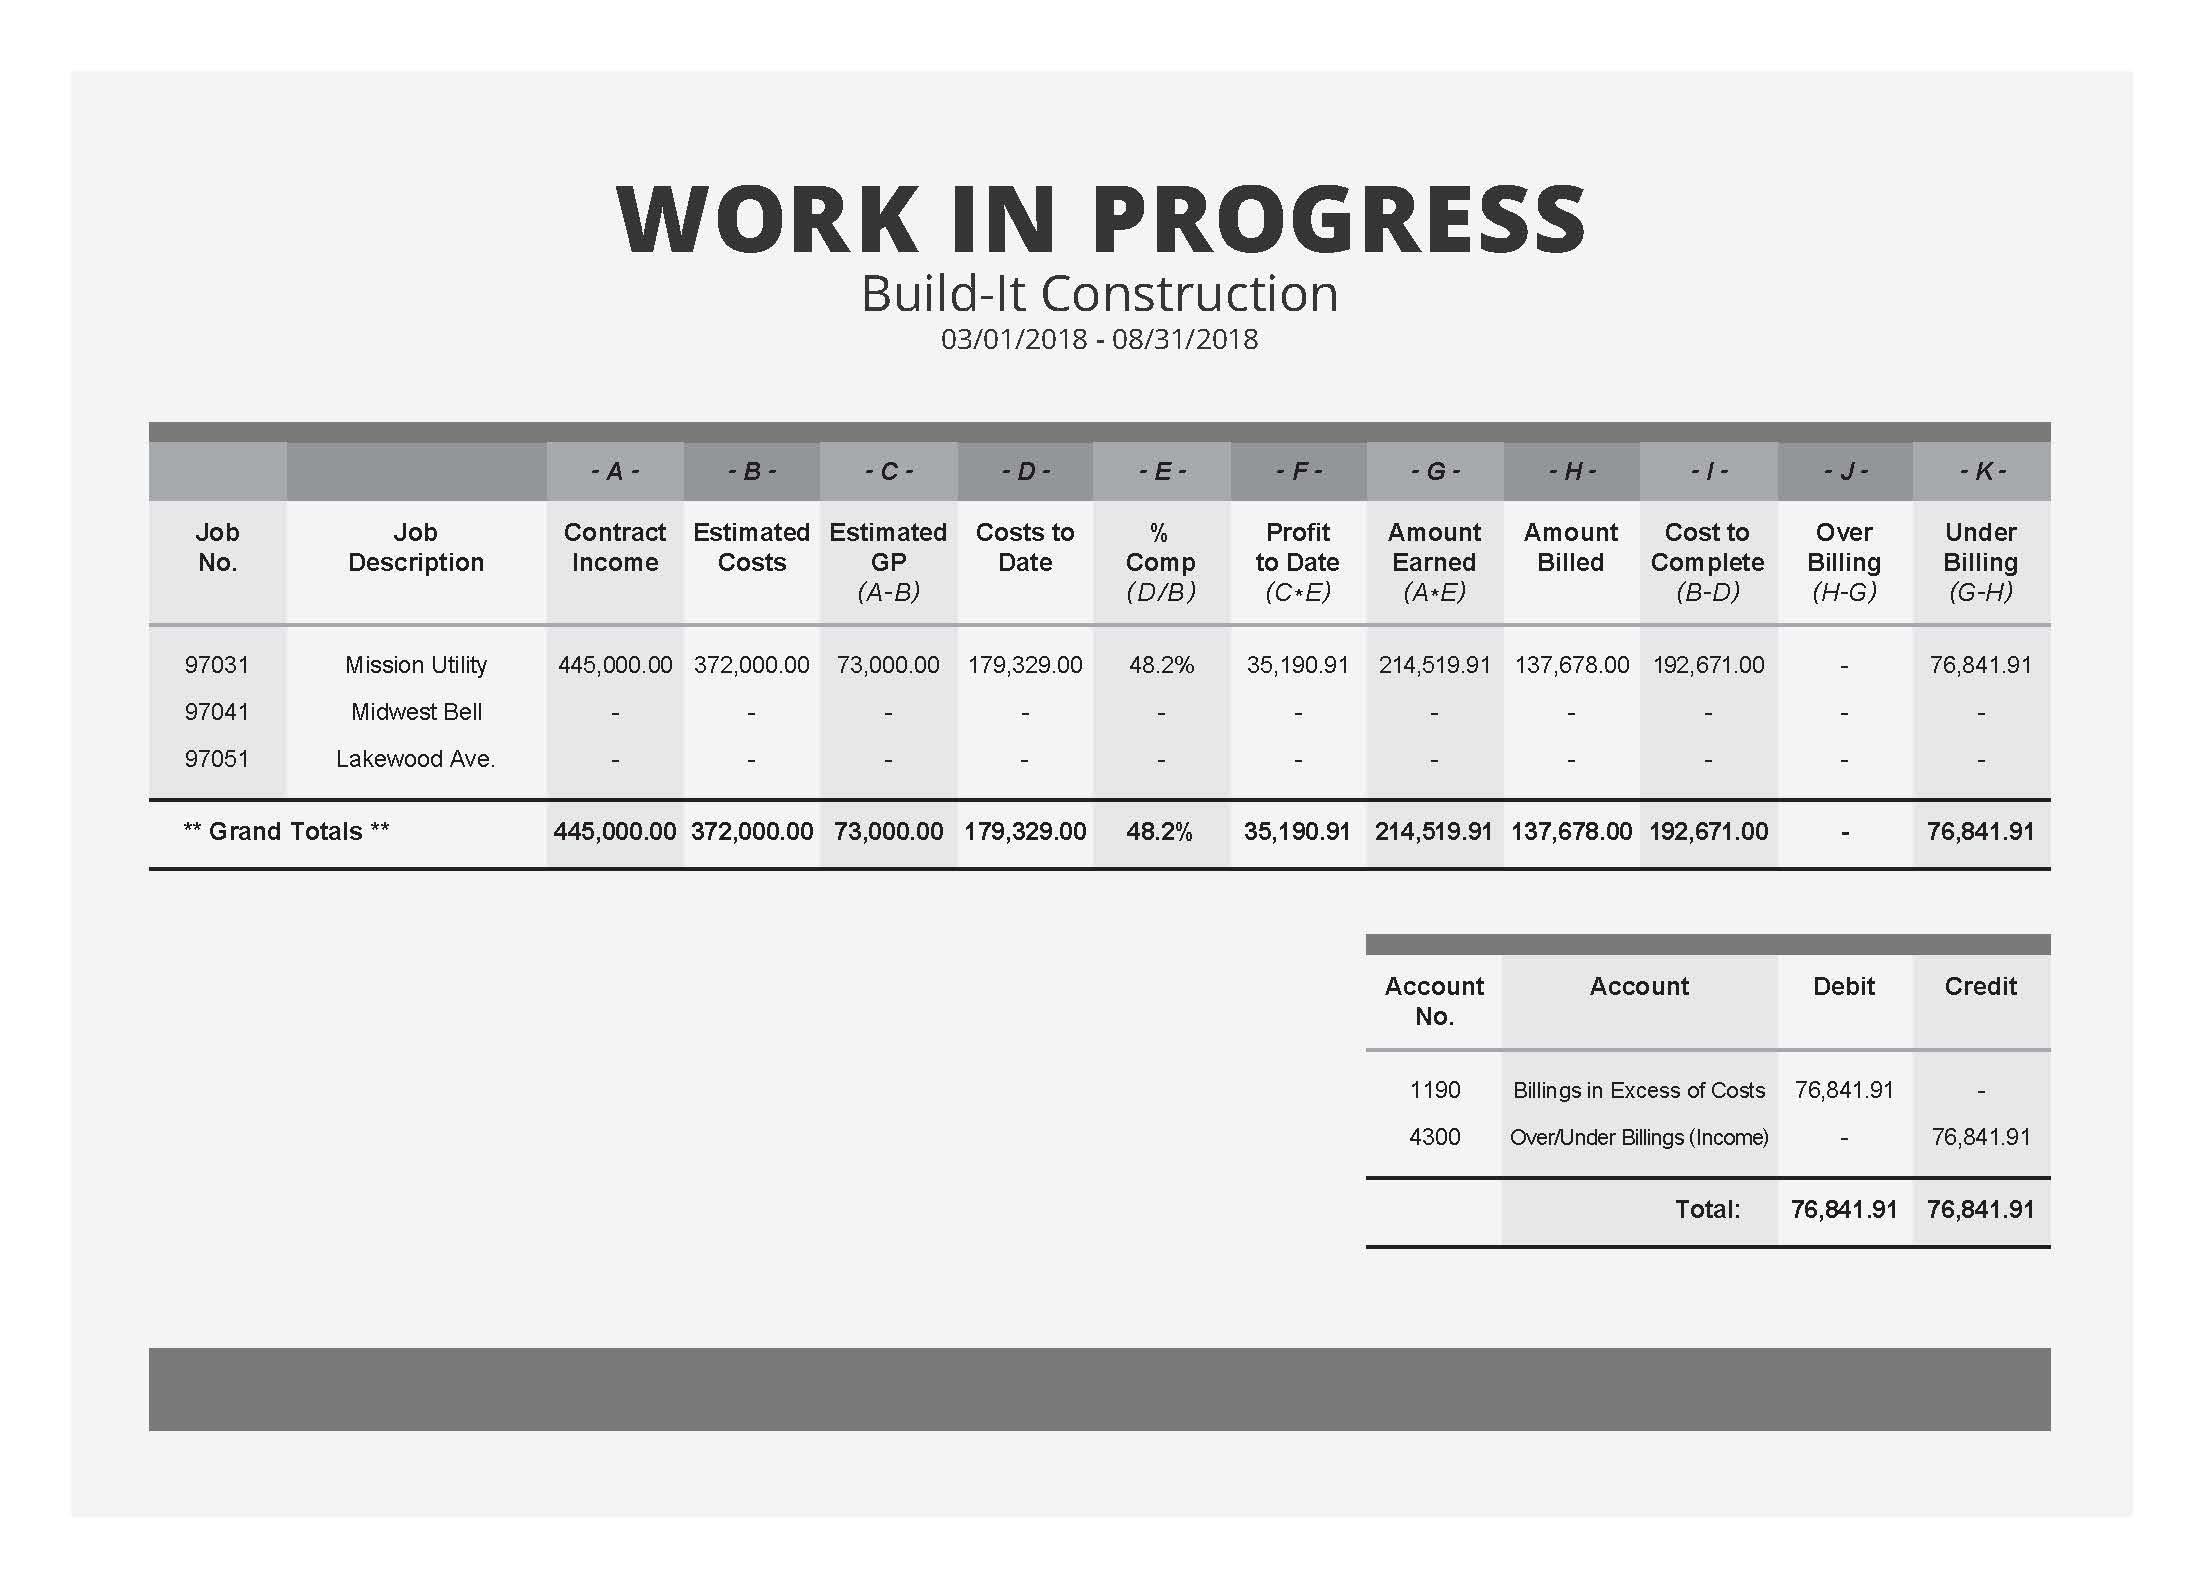 Construction Work In Progress Spreadsheet